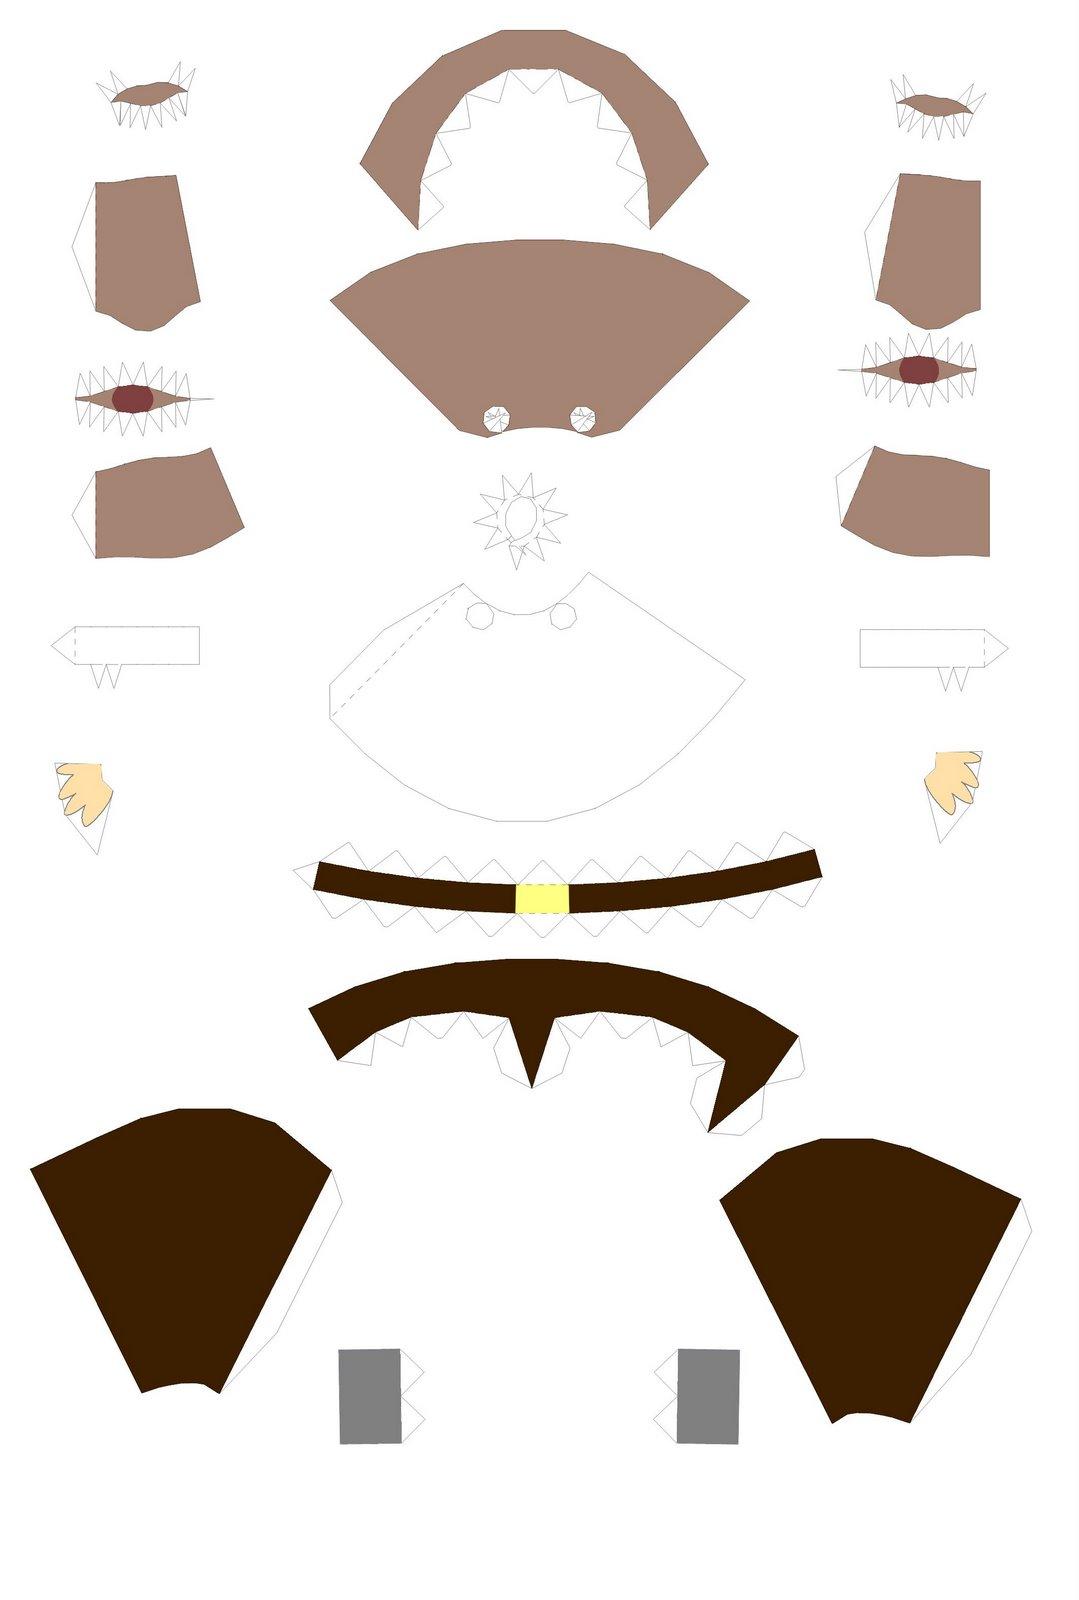 http://3.bp.blogspot.com/-T5VJpFPlPPE/Tj4NYZOv-_I/AAAAAAAAAVo/Y9ni3SieGRo/s1600/mrbean_papercraft2.JPG